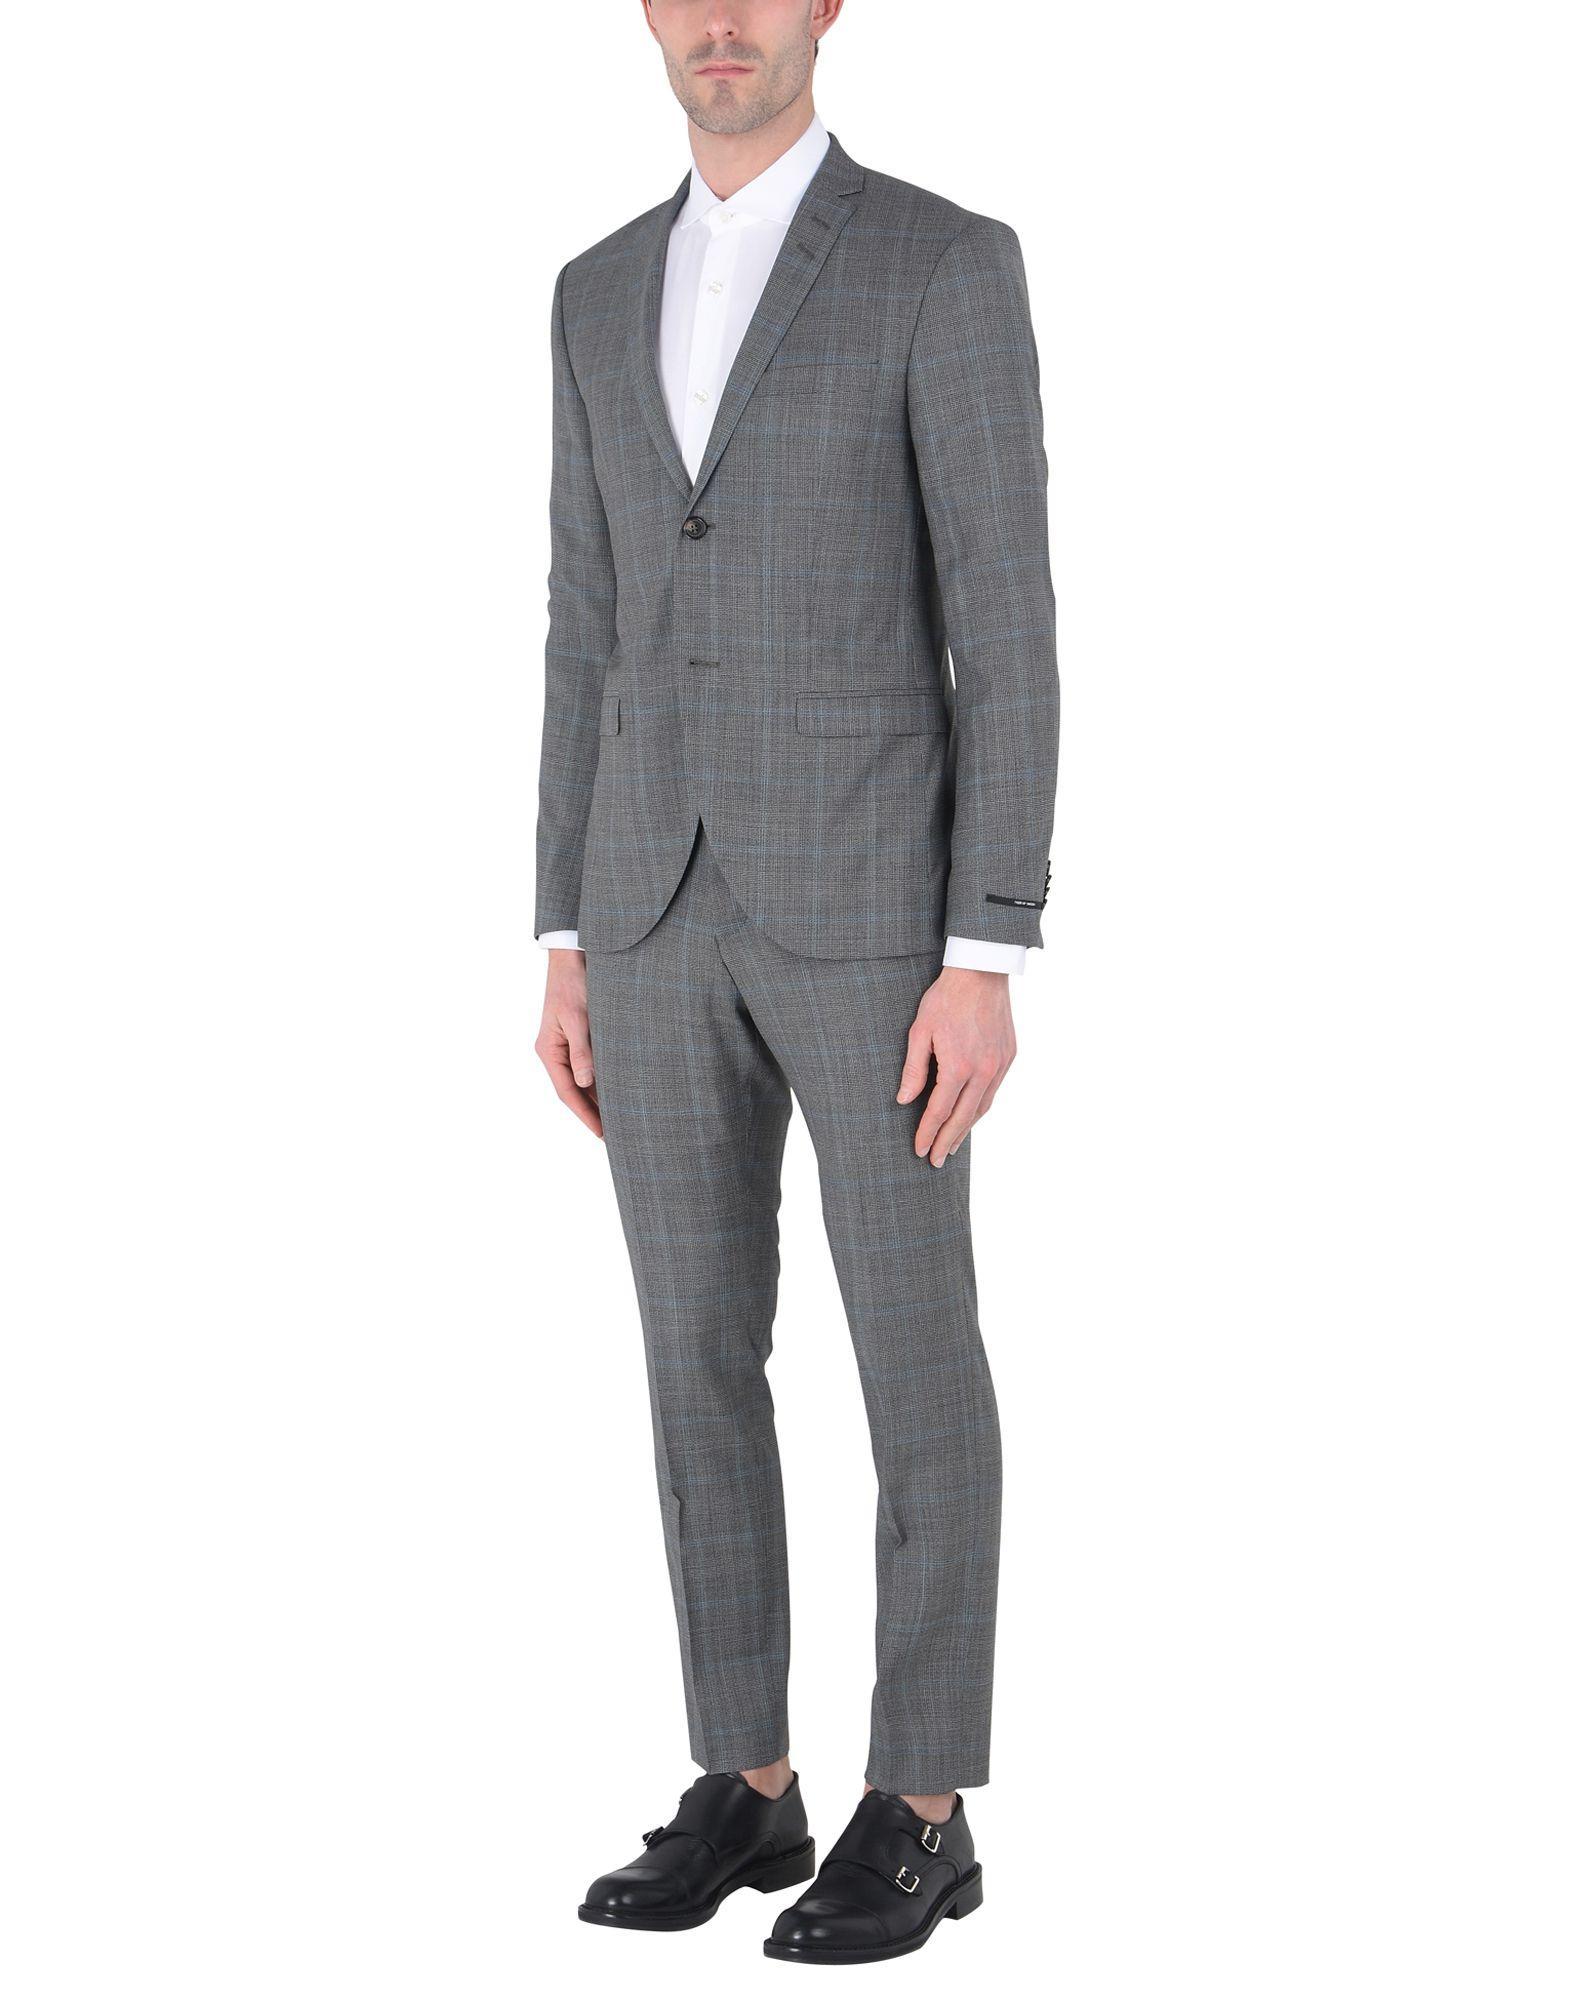 Tiger Of Sweden Suits In Grey